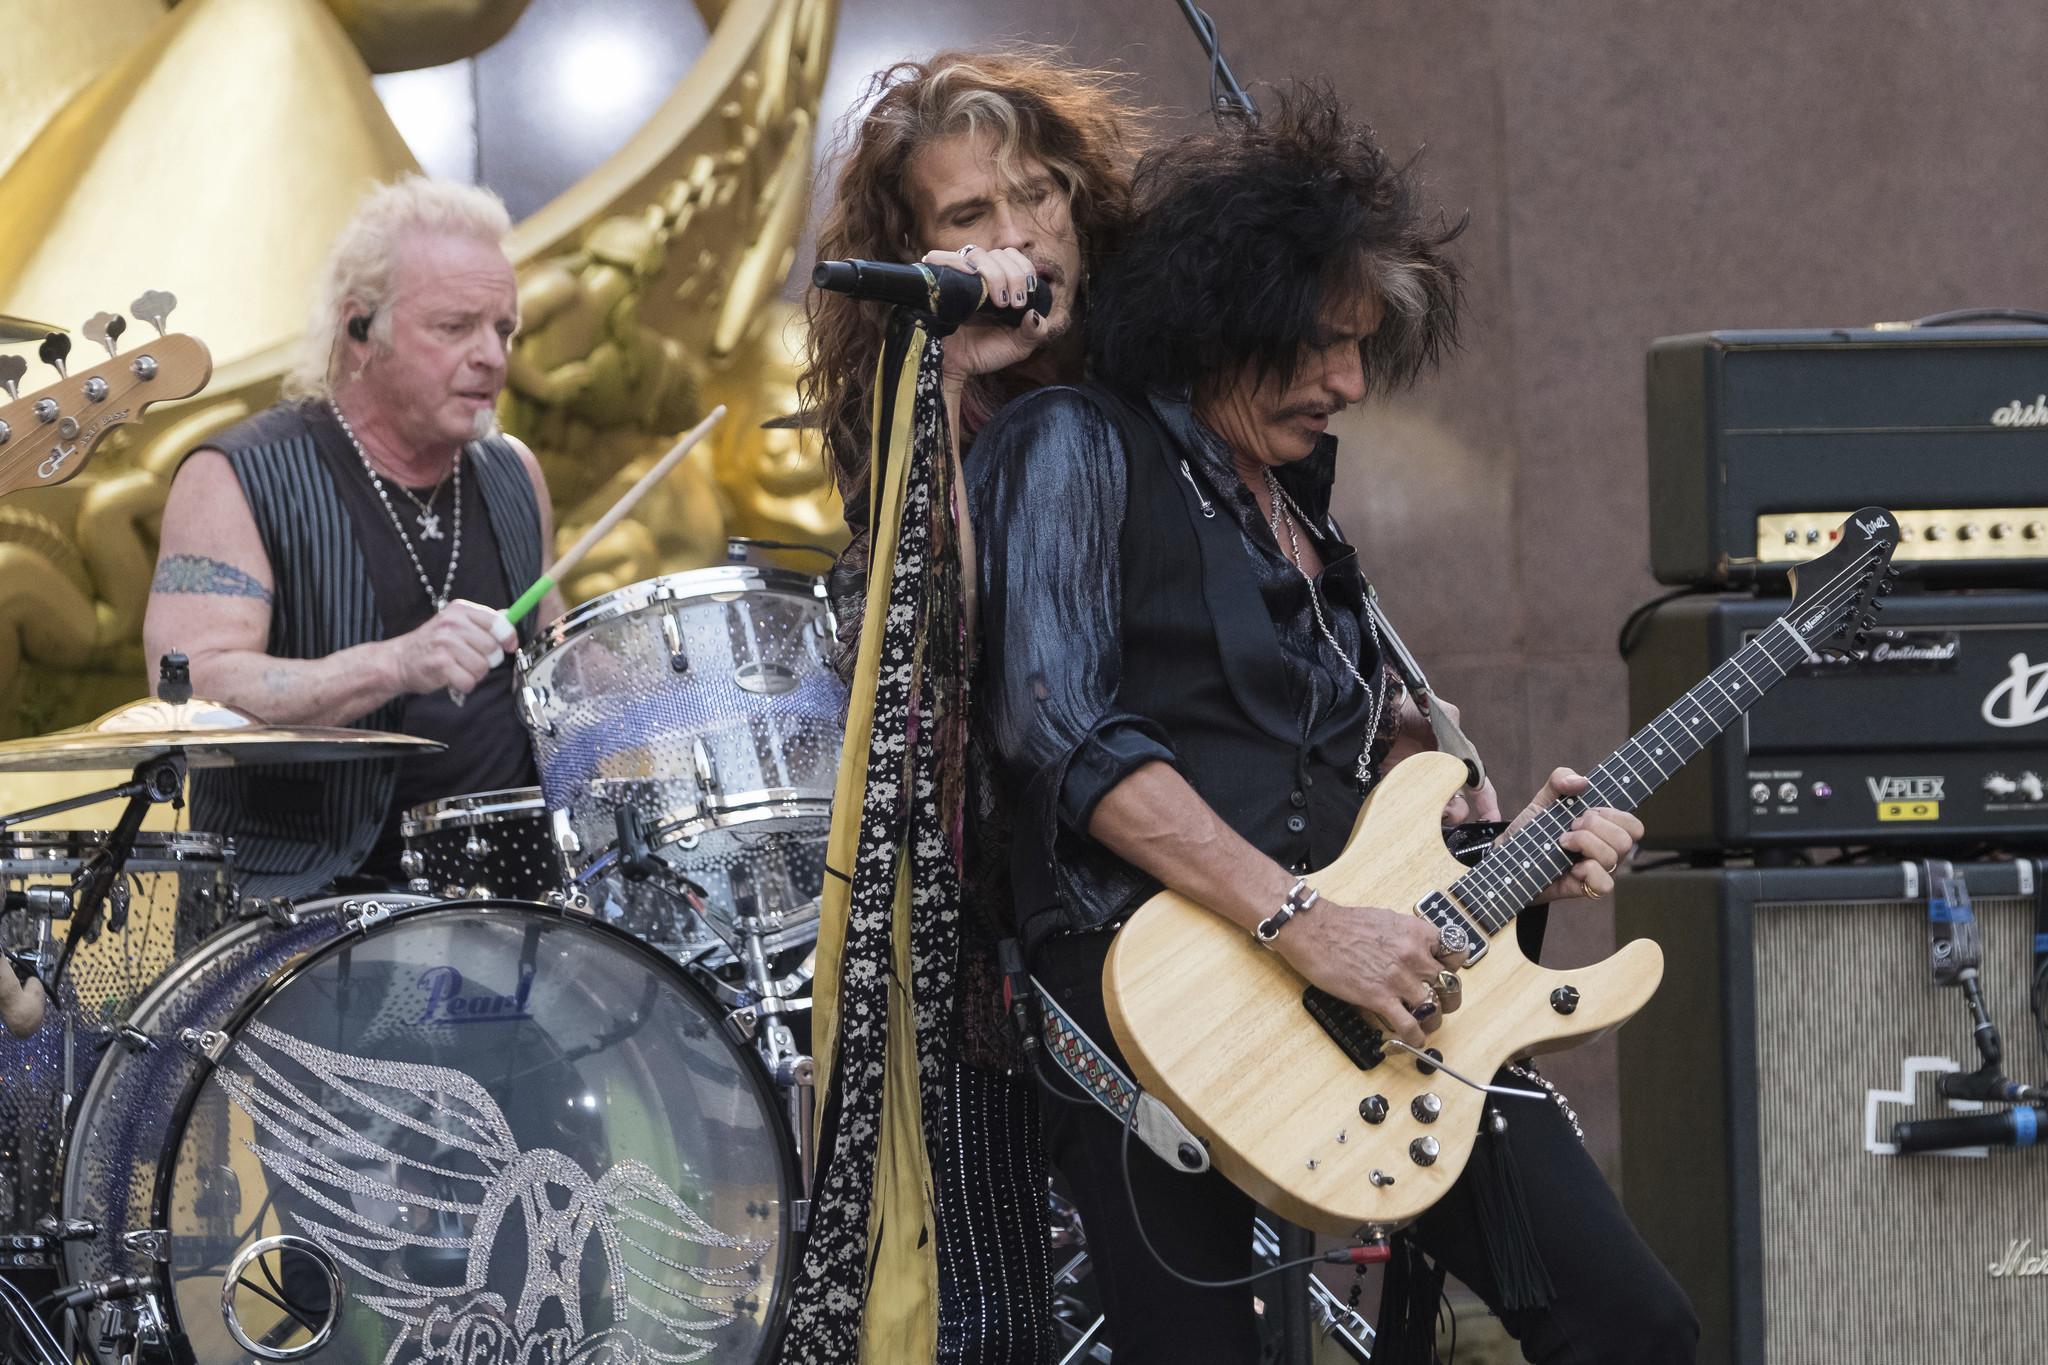 Aerosmith drummer Joey Kramer sues Steven Tyler and other bandmates for blocking his return